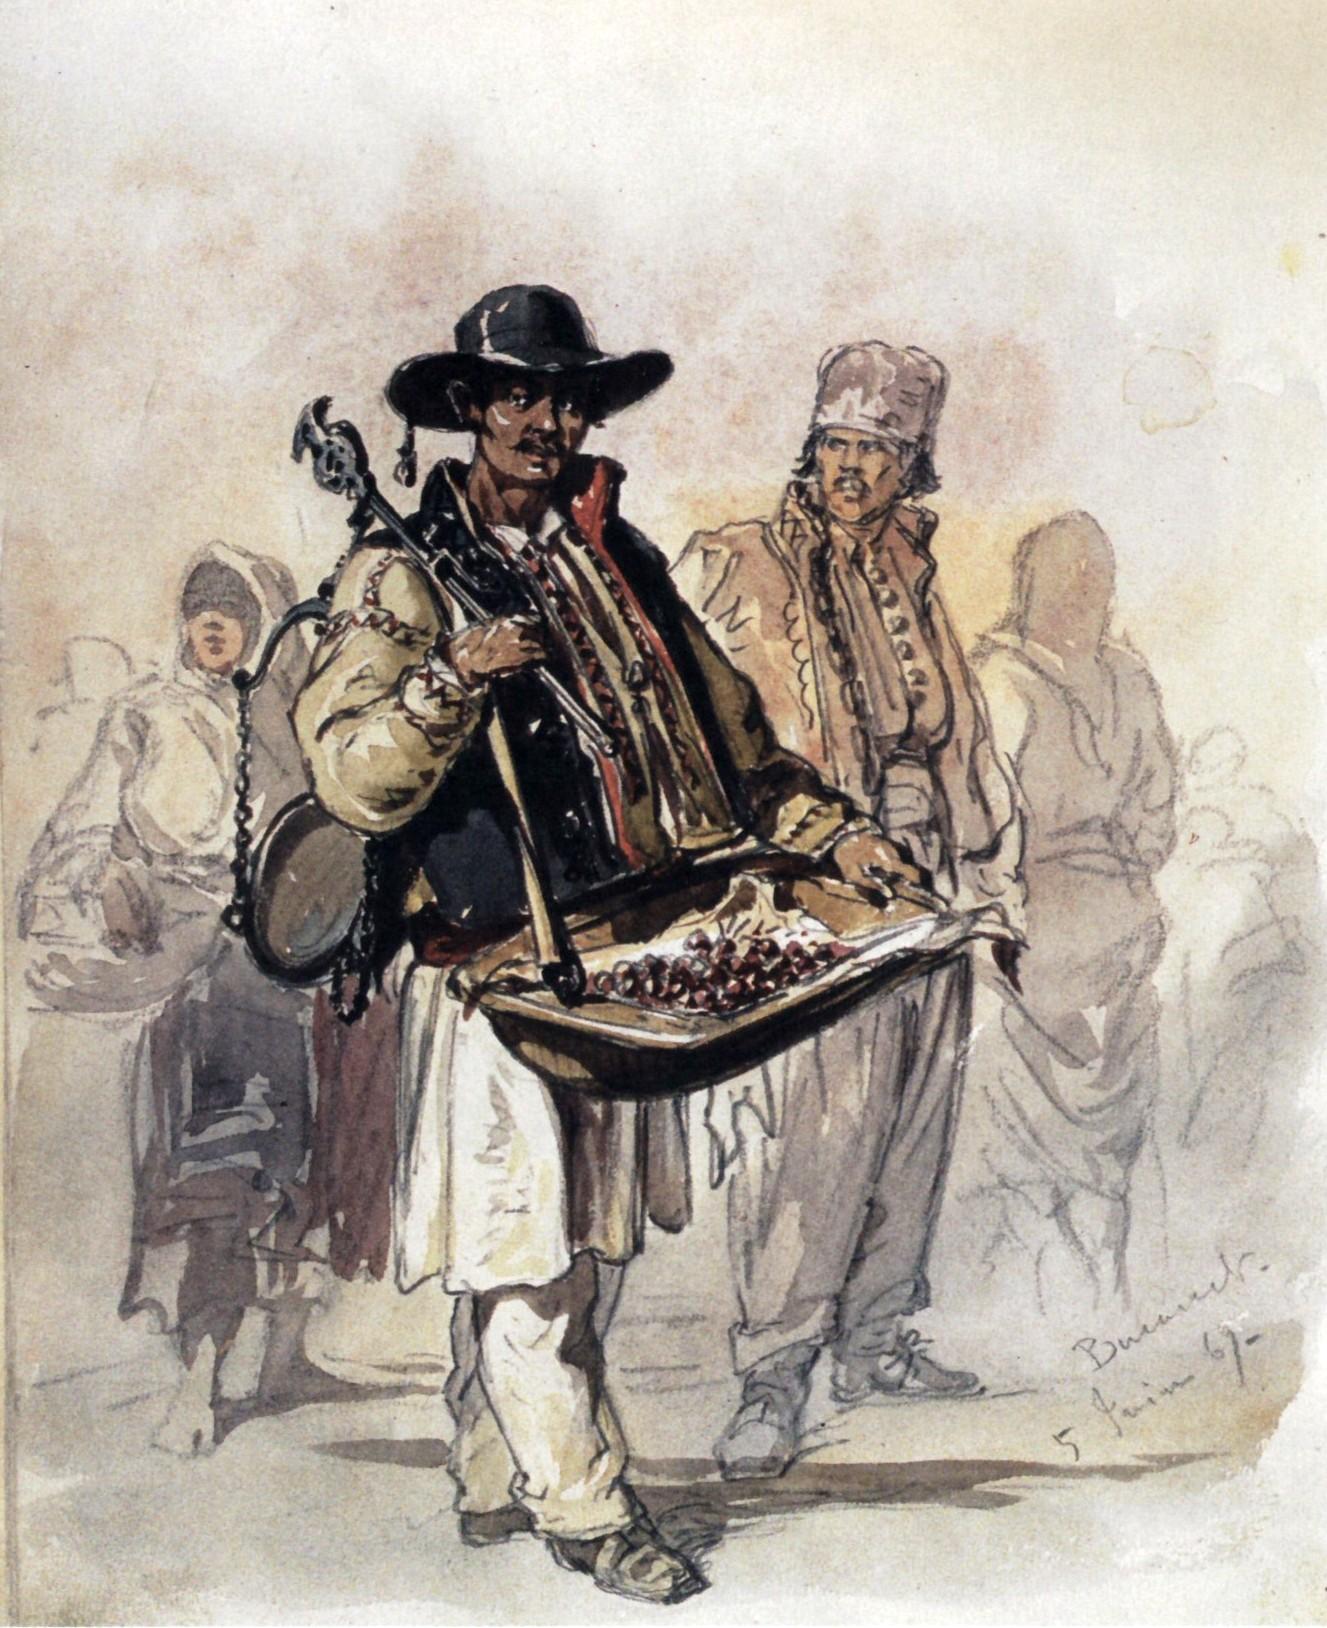 Preziosi - Cherry peddler, 1869.jpg